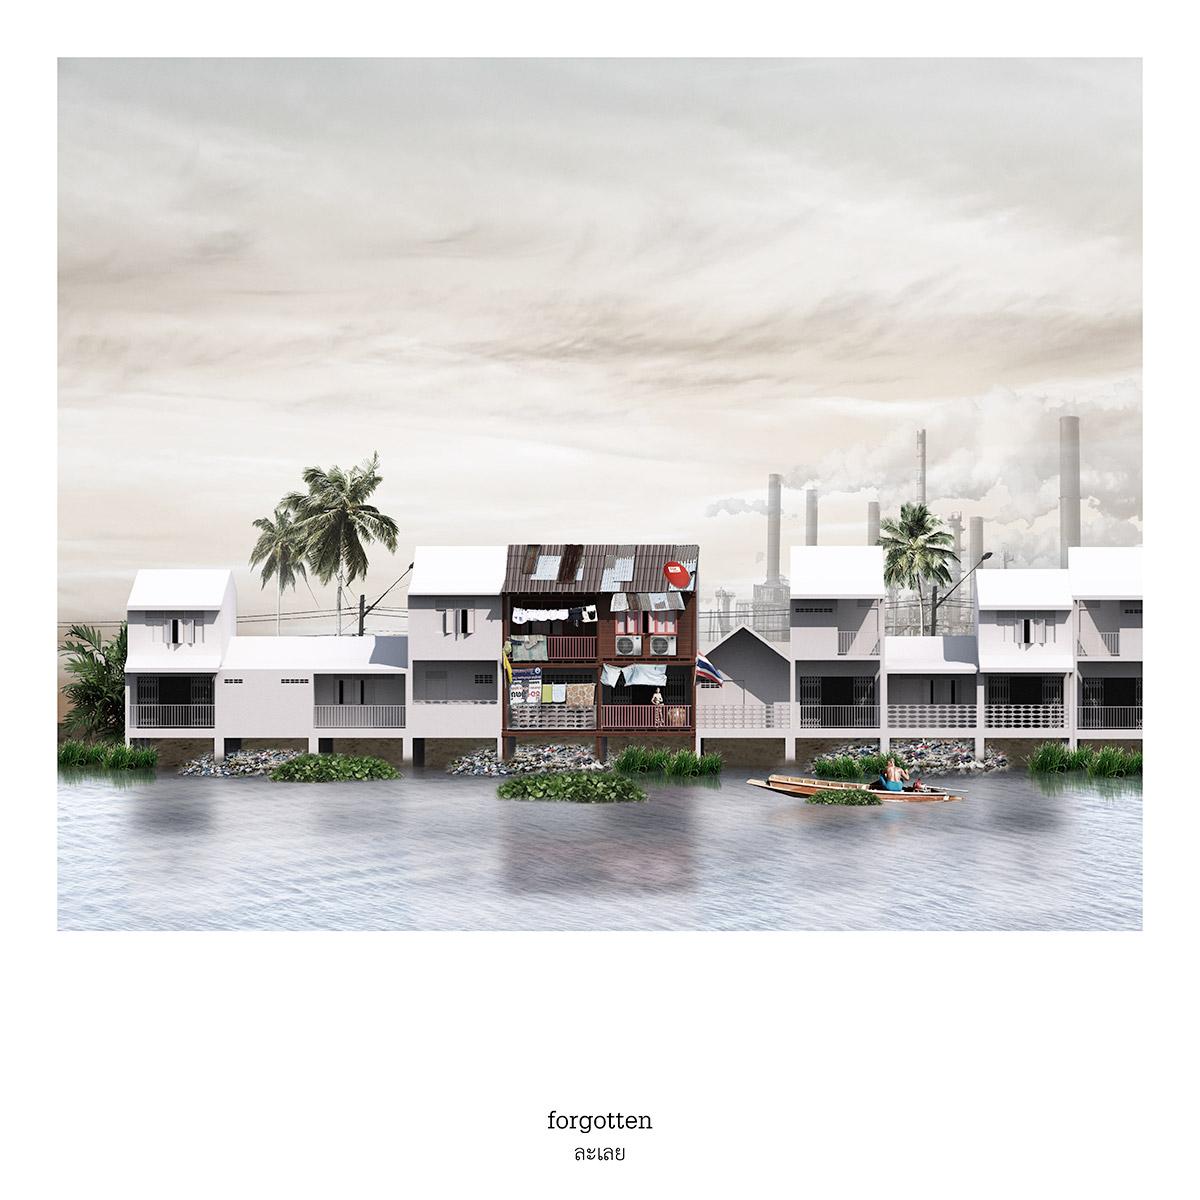 "verasustudio work, FIVE REMAINDERS OF VERNACULAR ARCHITECTURE, 2018,FORGOTTEN,""ละเลย"""